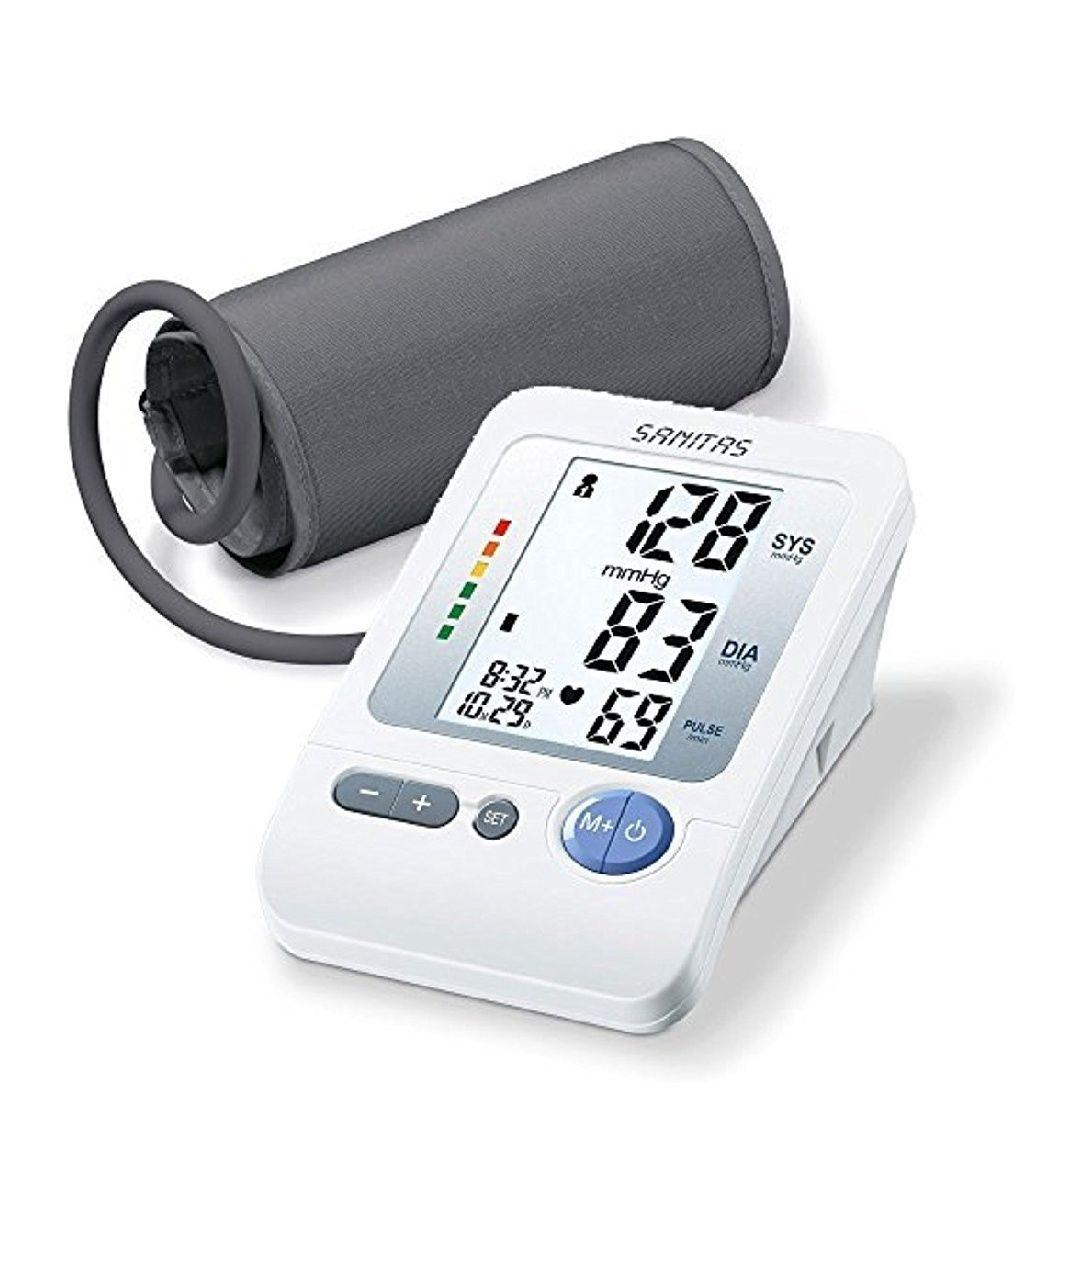 Amazon Prime Day Sanitas SBM 21 Oberarm-Blutdruckmessgerät